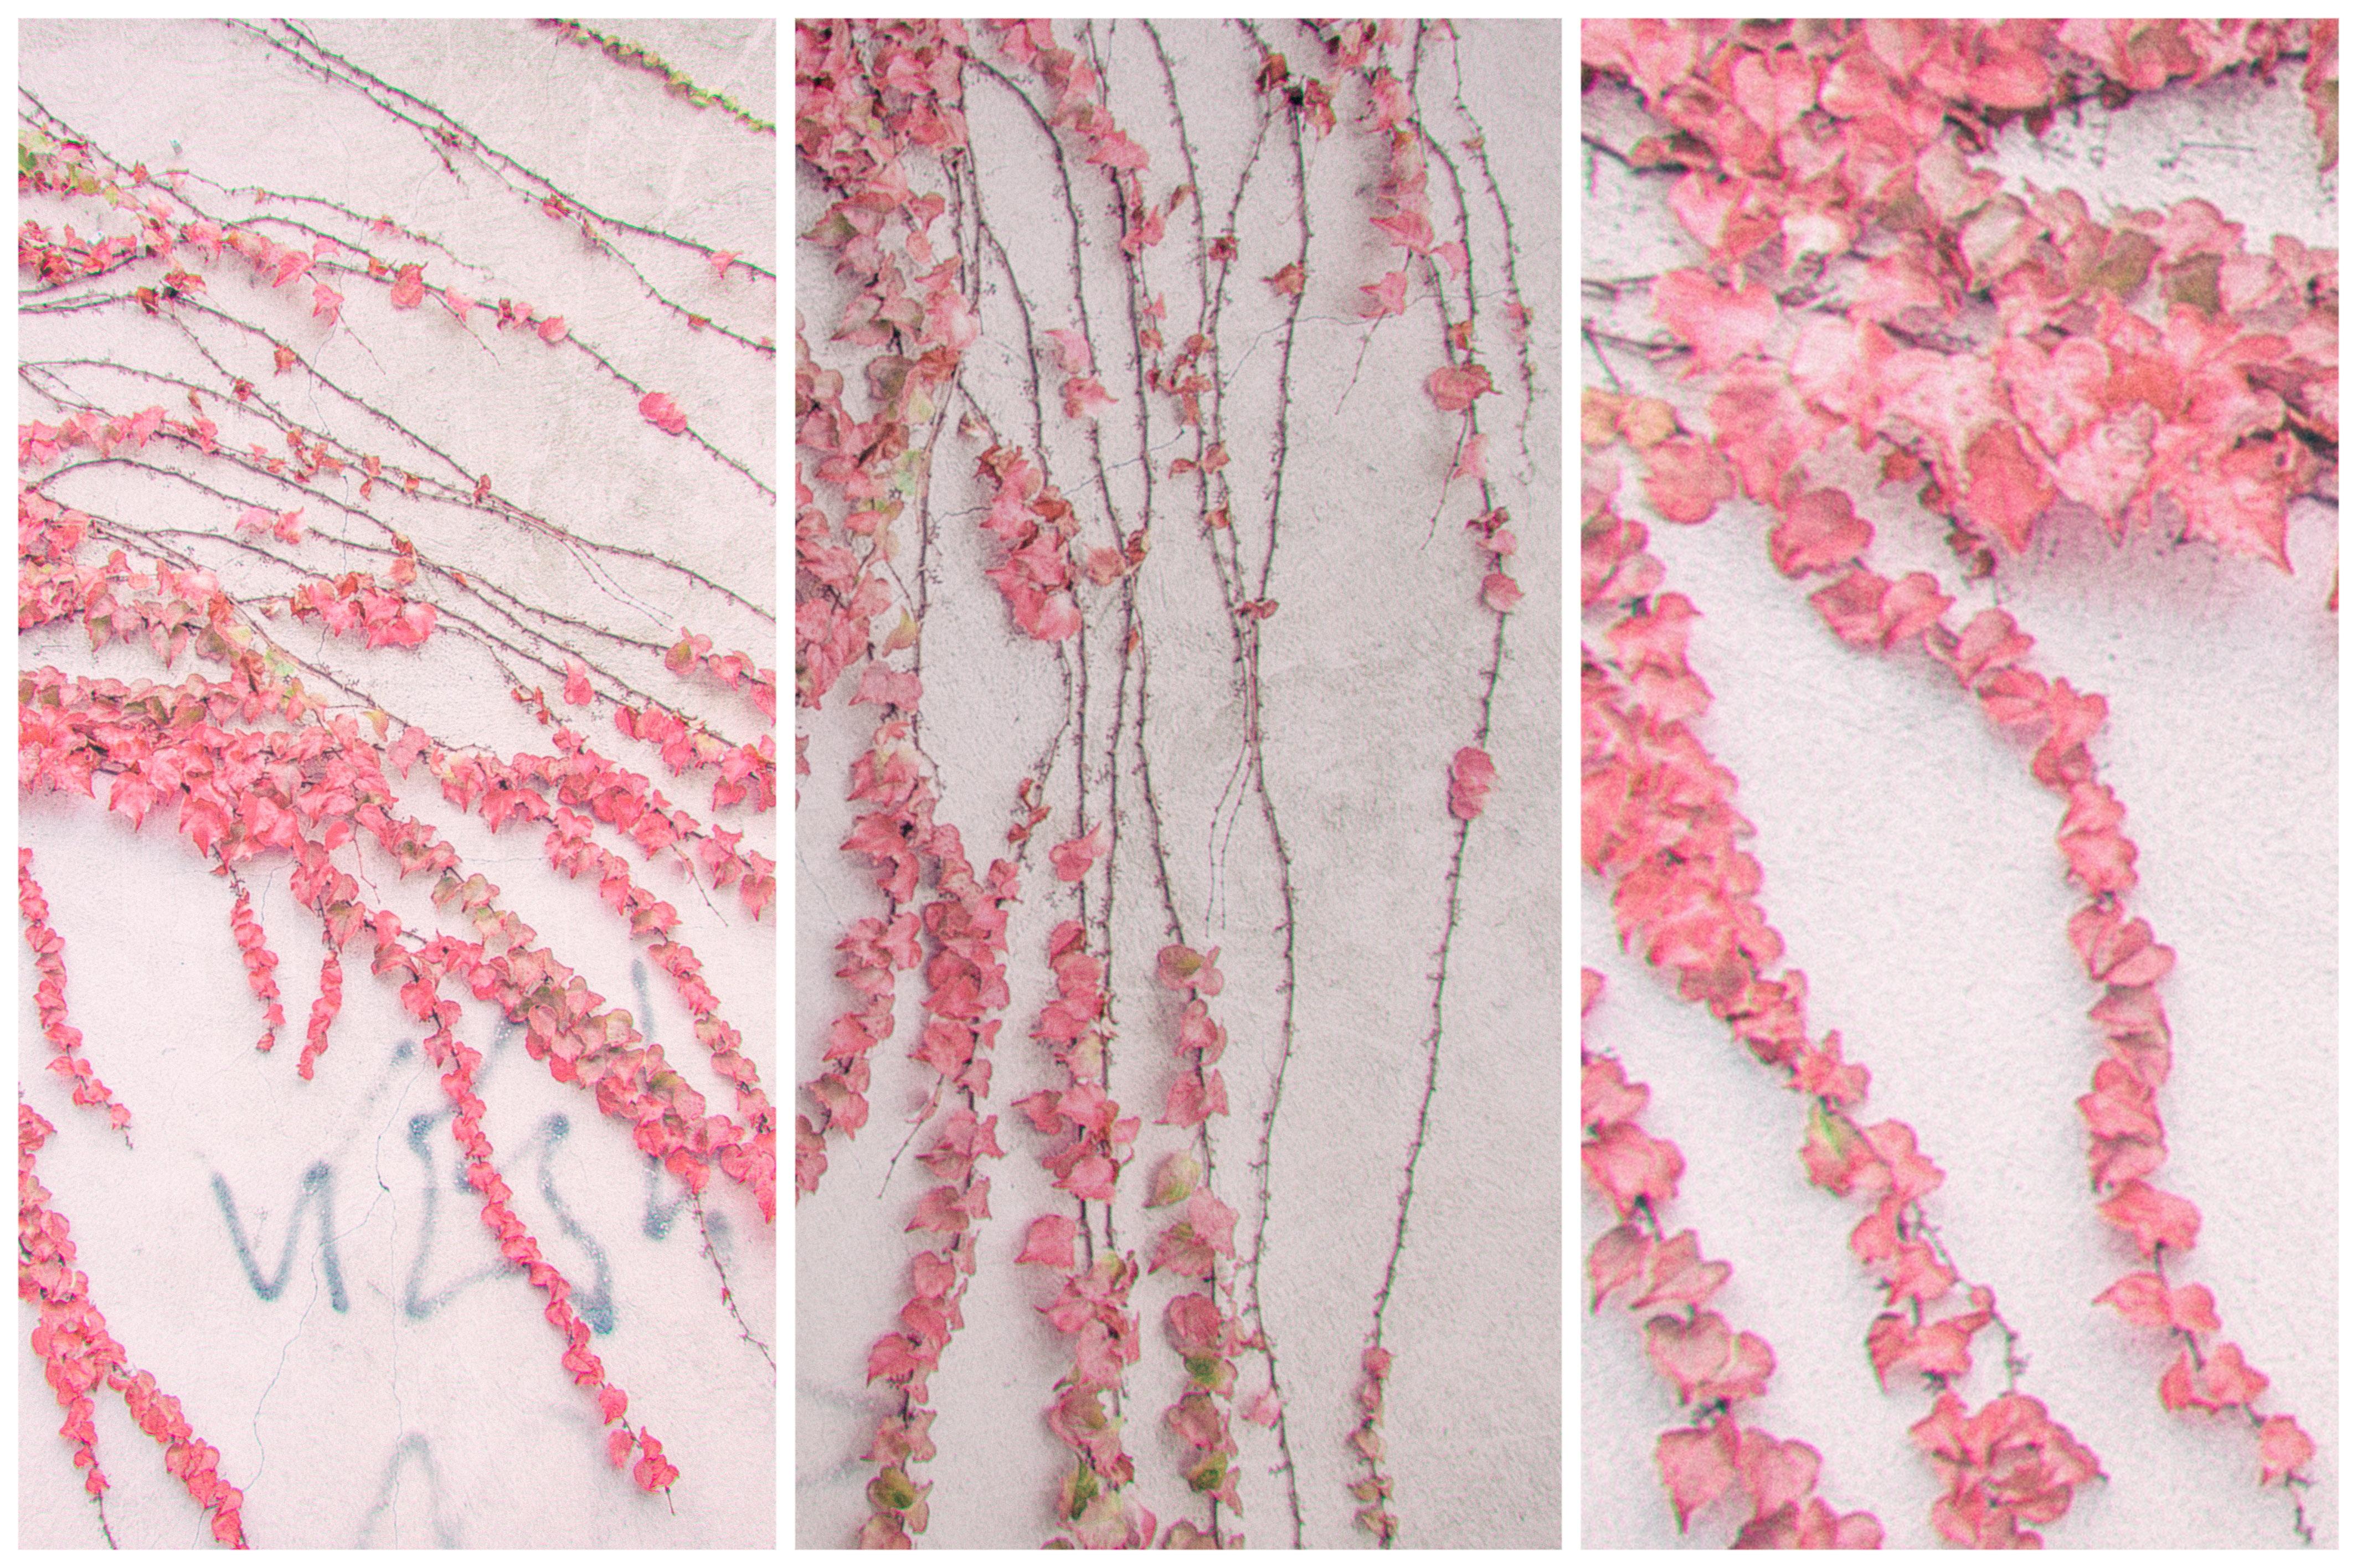 Kostenlose foto : Natur, Pflanze, Mauer, Muster, Efeu, Herbst ...